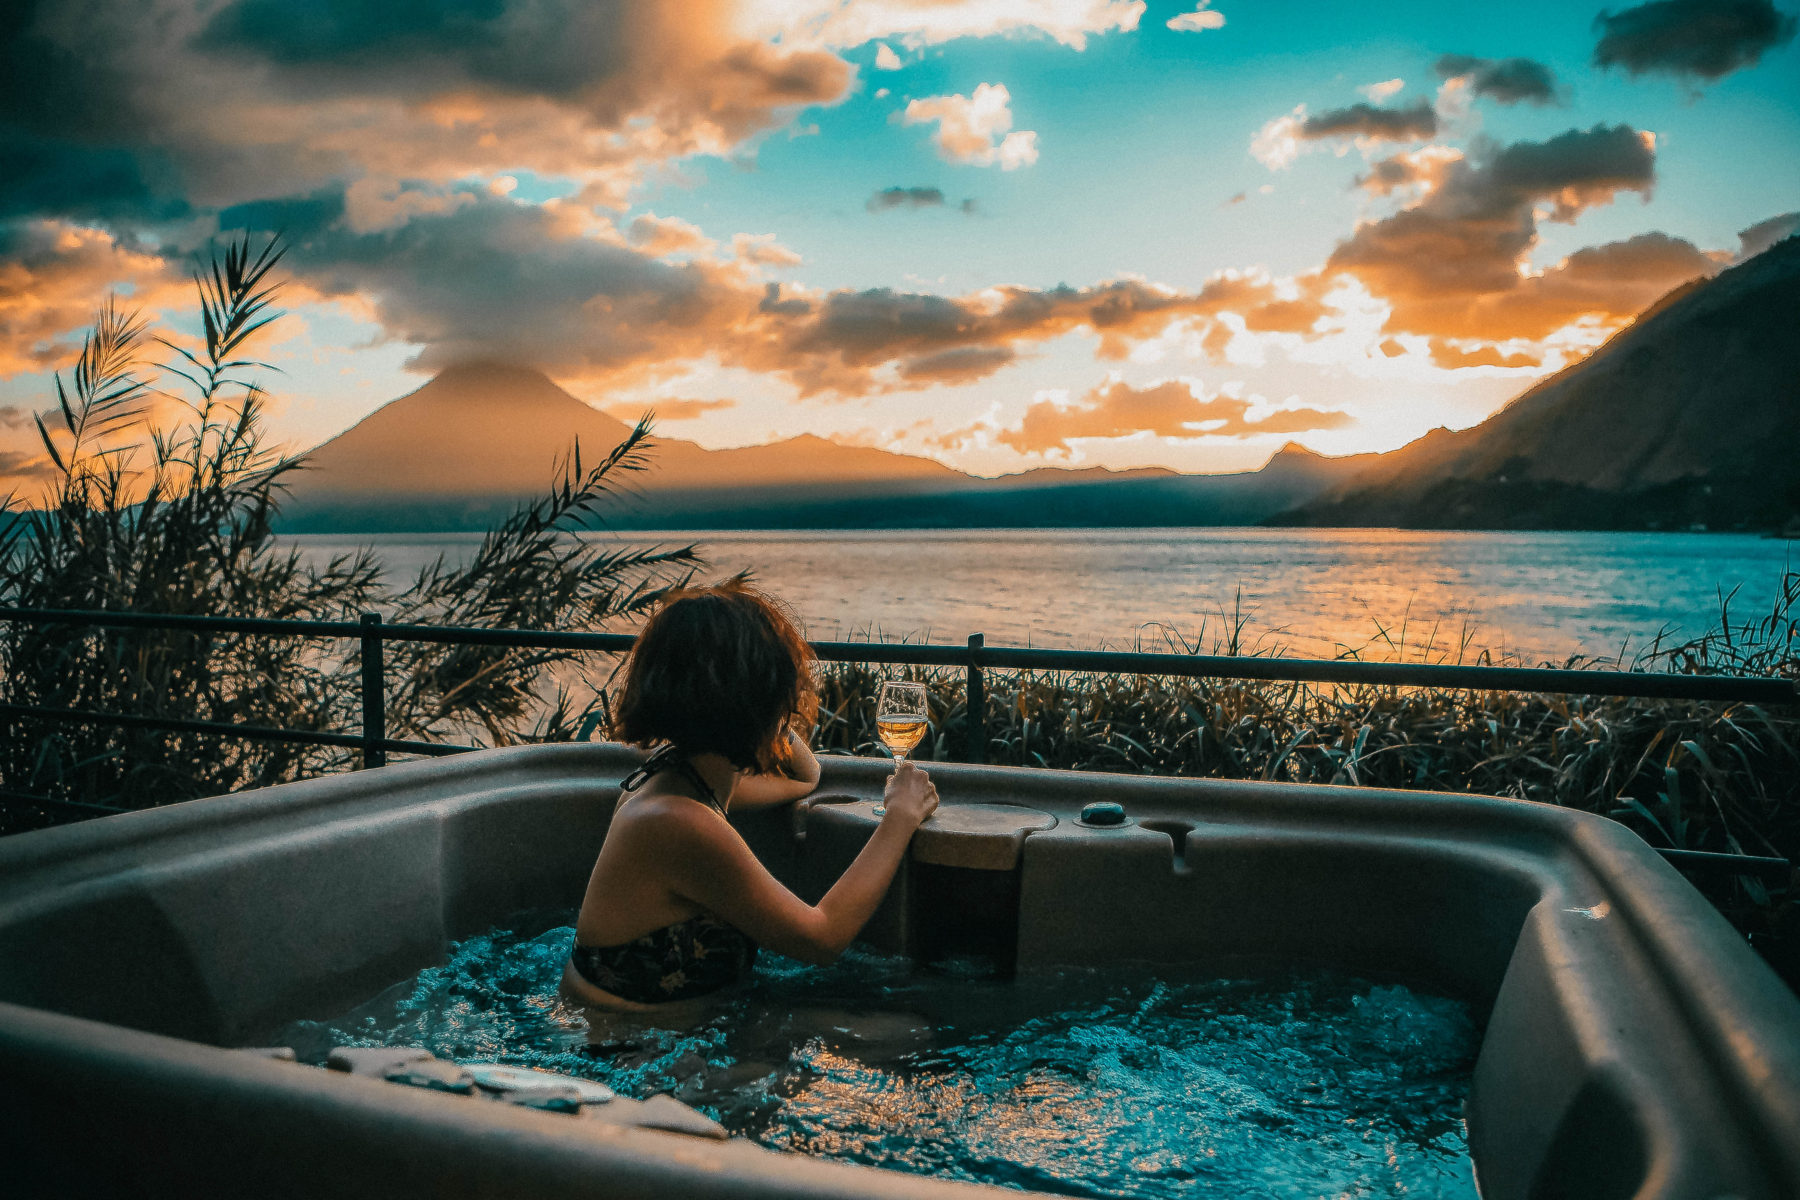 guatemala lake atitlan lago central america most beautiful lake in the world blue water sunny day sunset